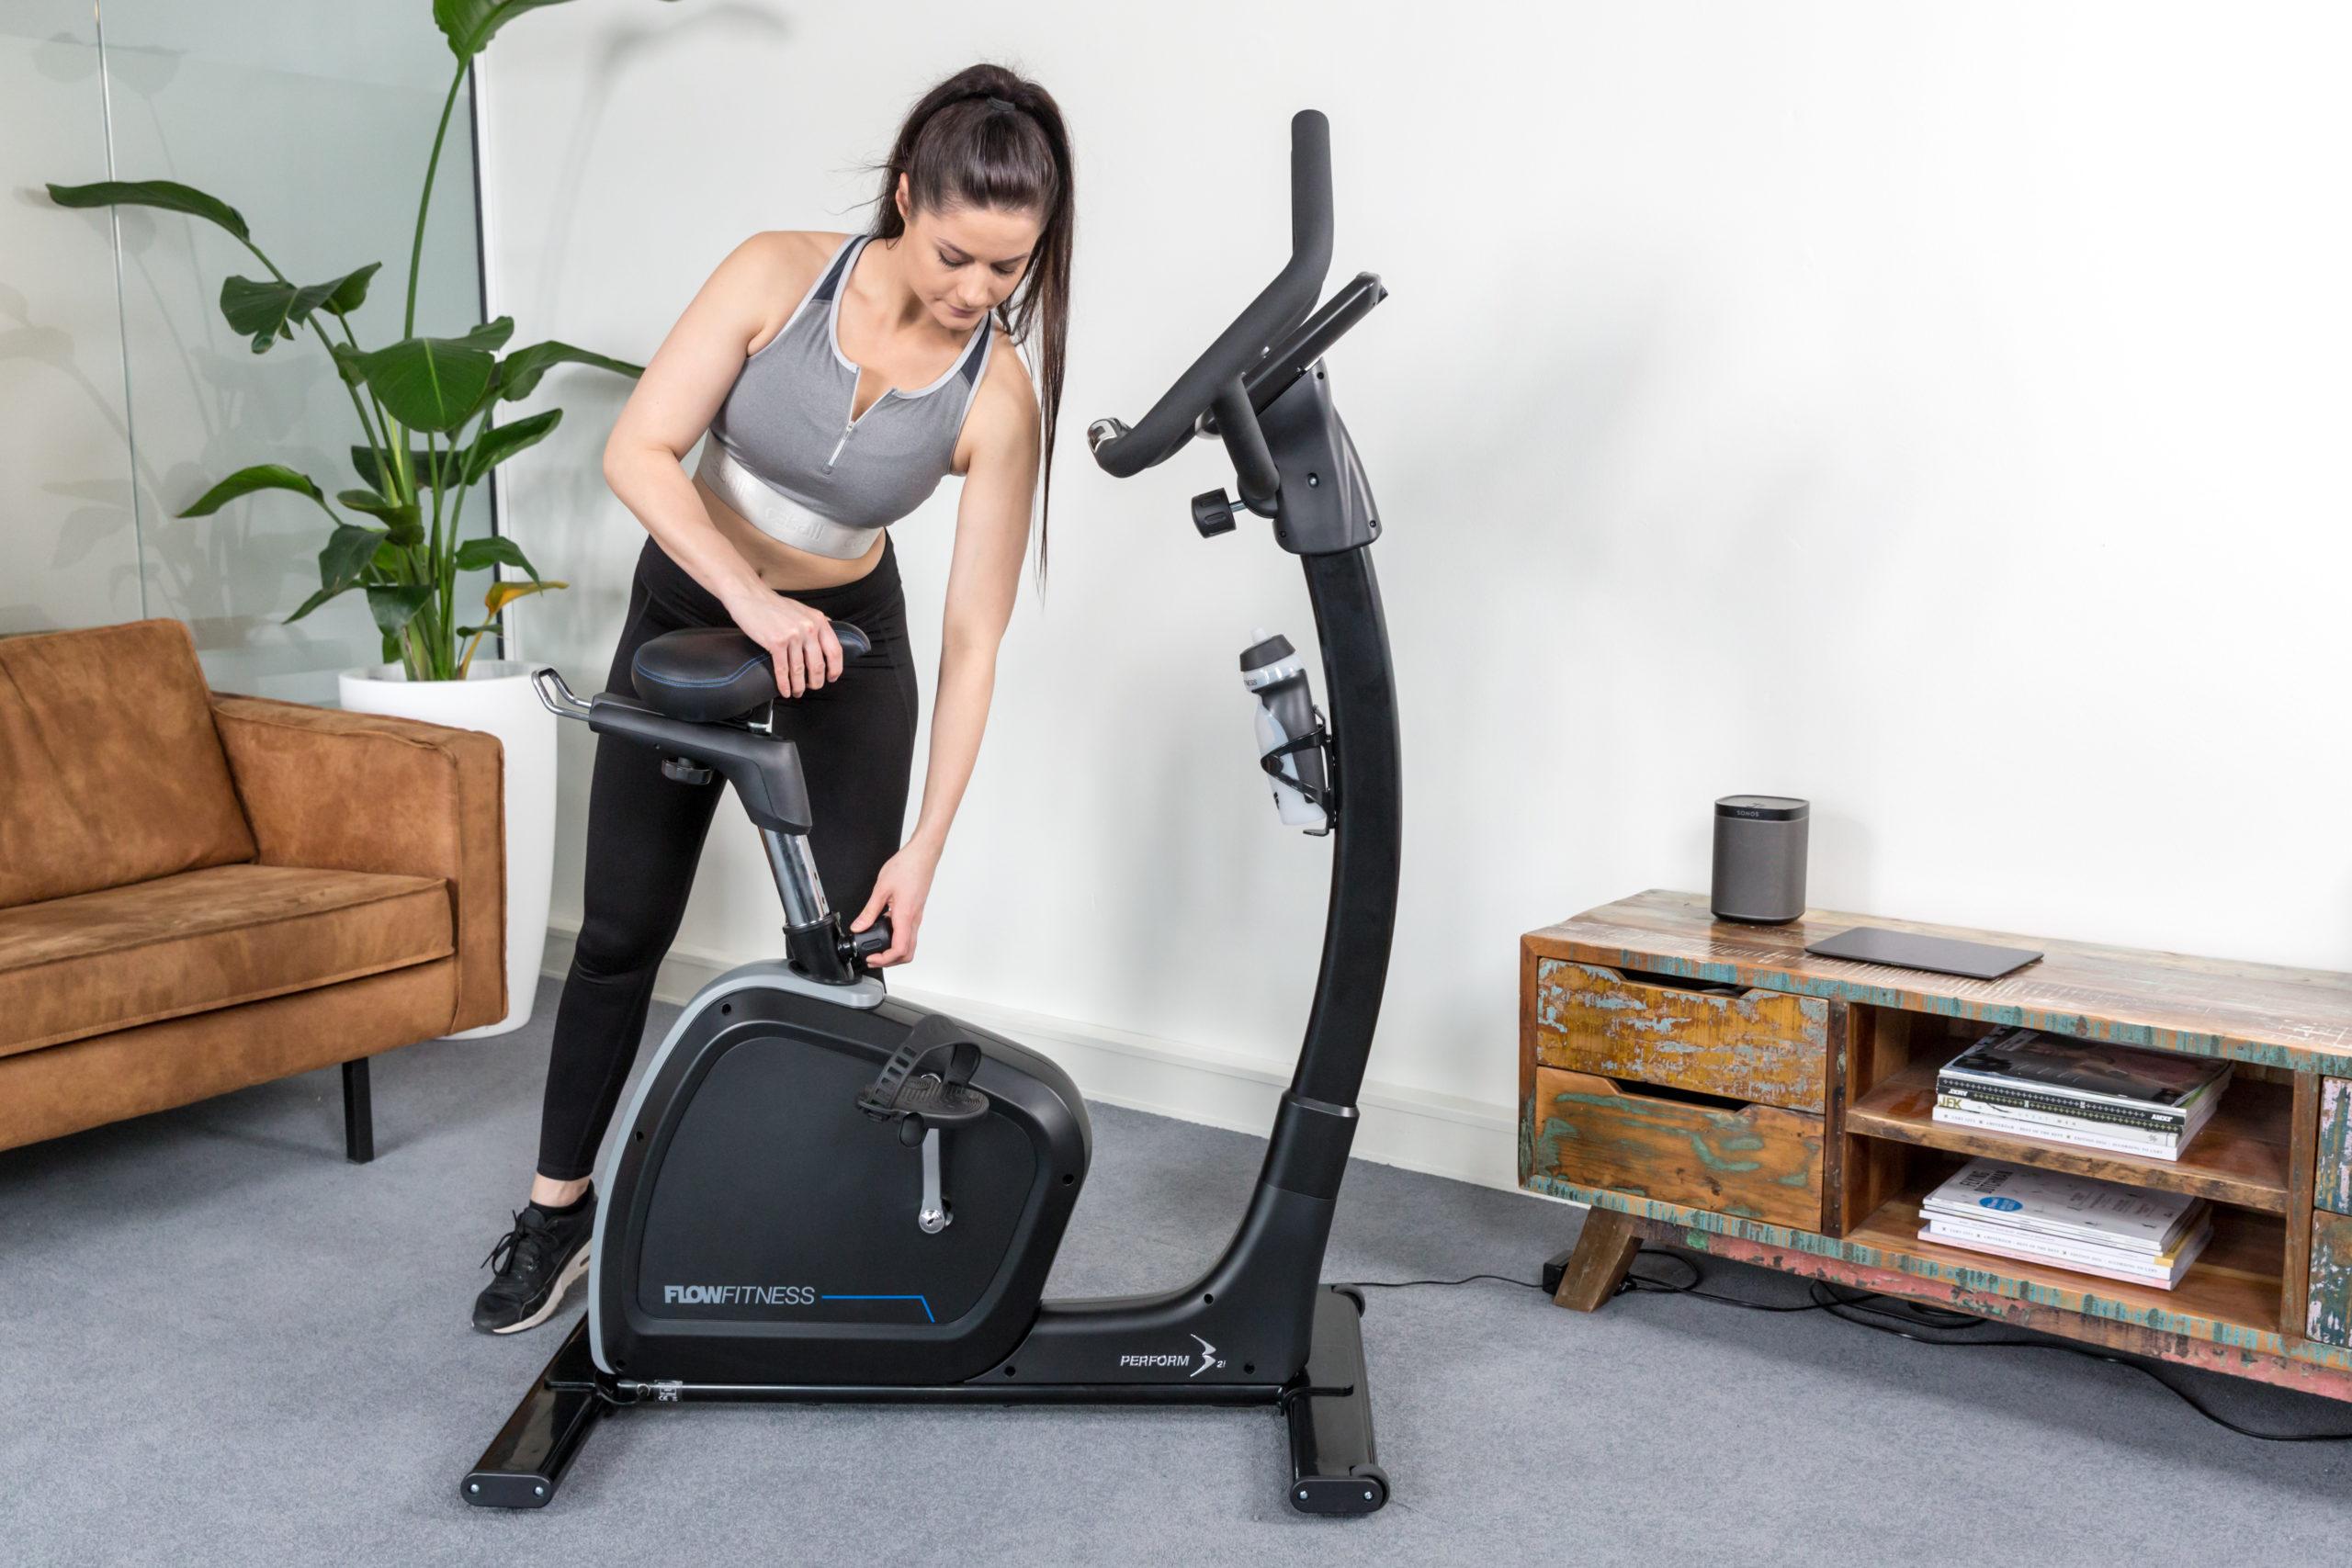 Flow Fitness Tabel PERFORM B2i Ergometer 2